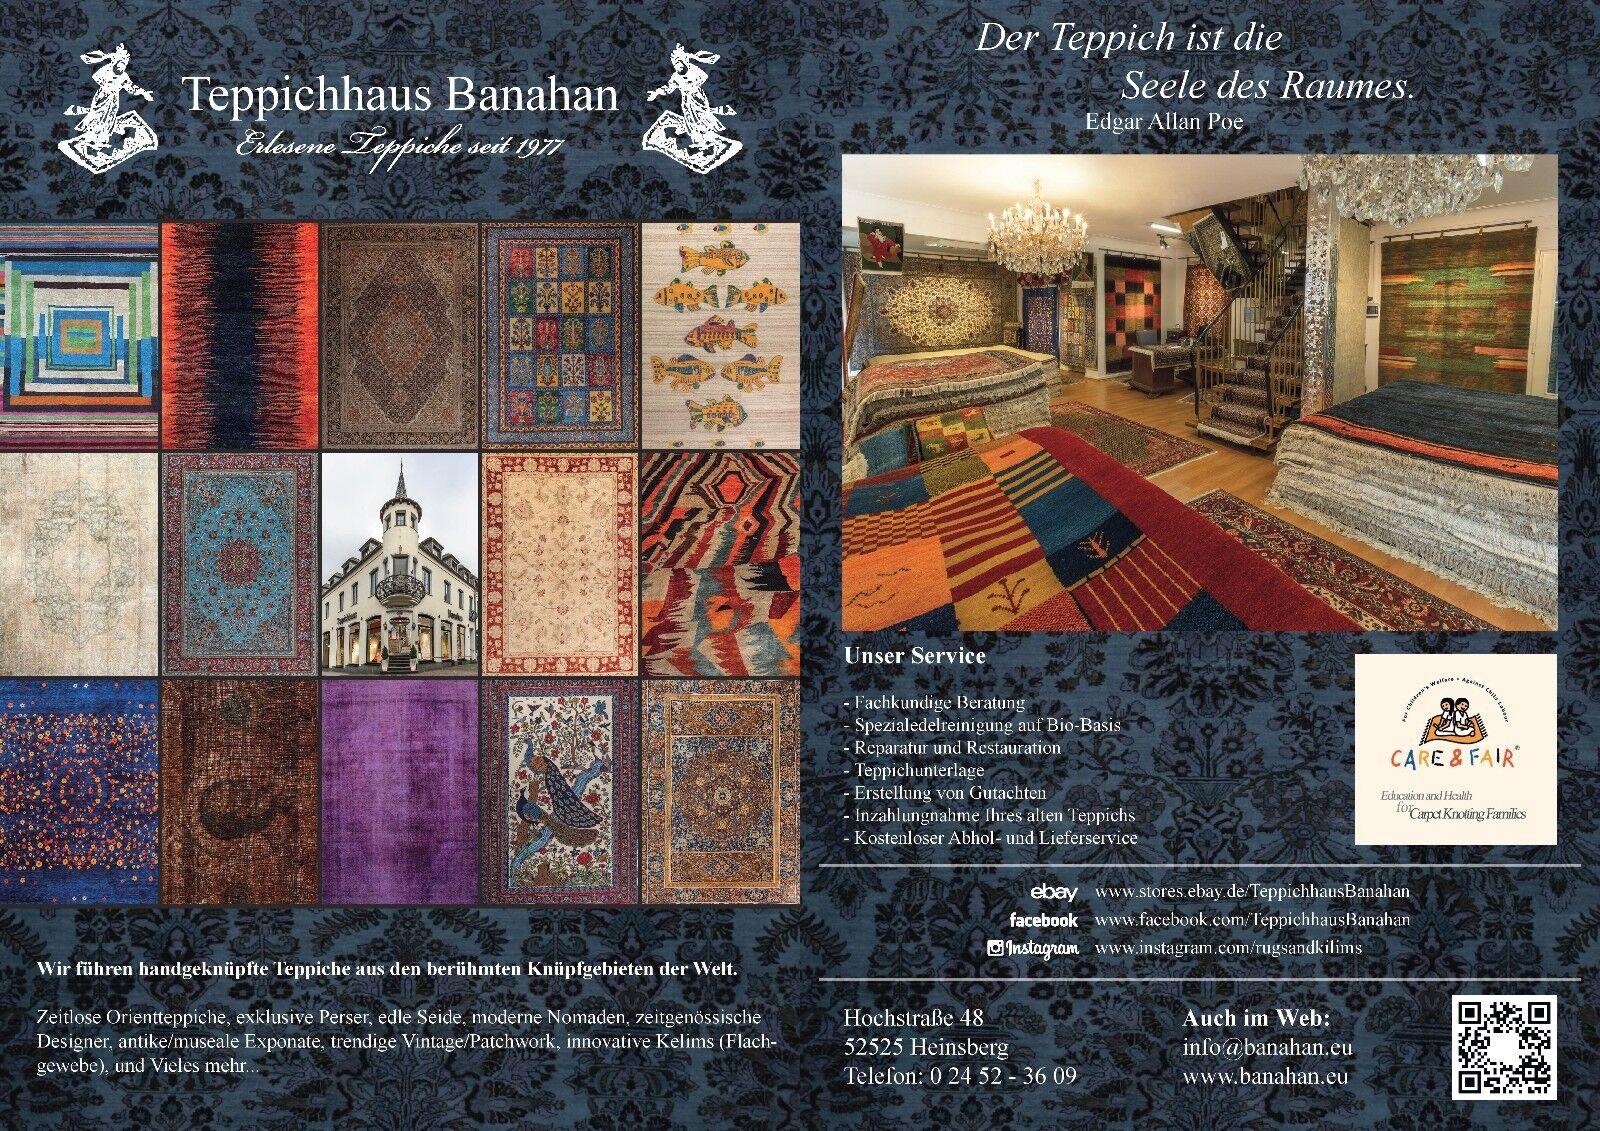 Moud Tapis Tapis Oriental Rug Rug Rug Carpet Tapis tapijt Tappeto Alfombra carré | Une Grande Variété De Modèles  0d4563